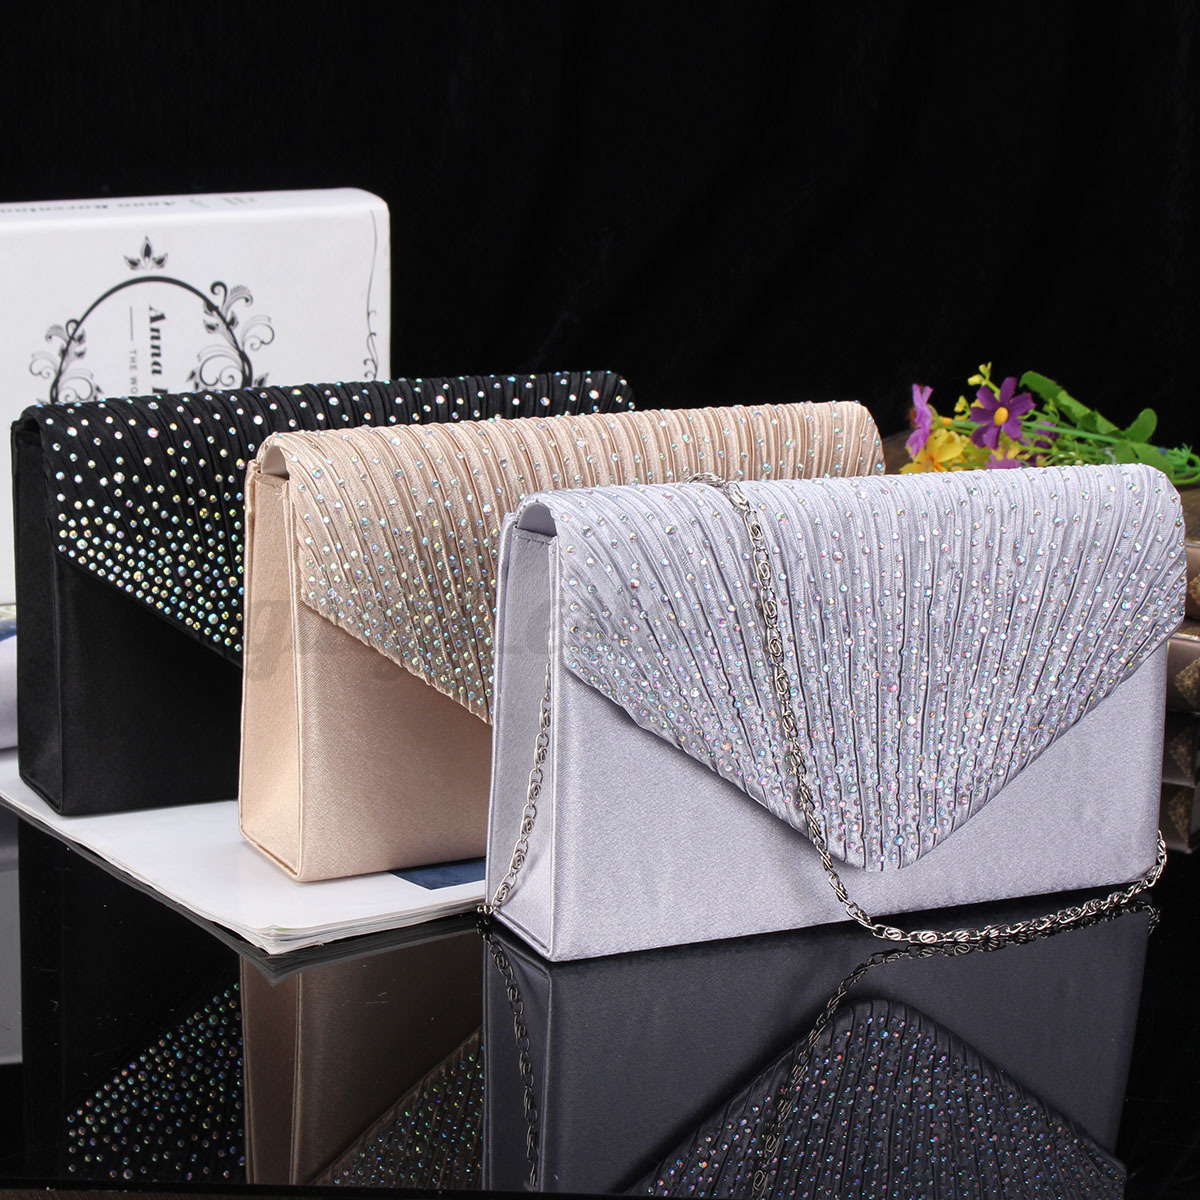 US-Women-Evening-Bag-Satin-Bridal-Clutch-Party-Envelope-Bag-Handbag-Small-Purse thumbnail 2